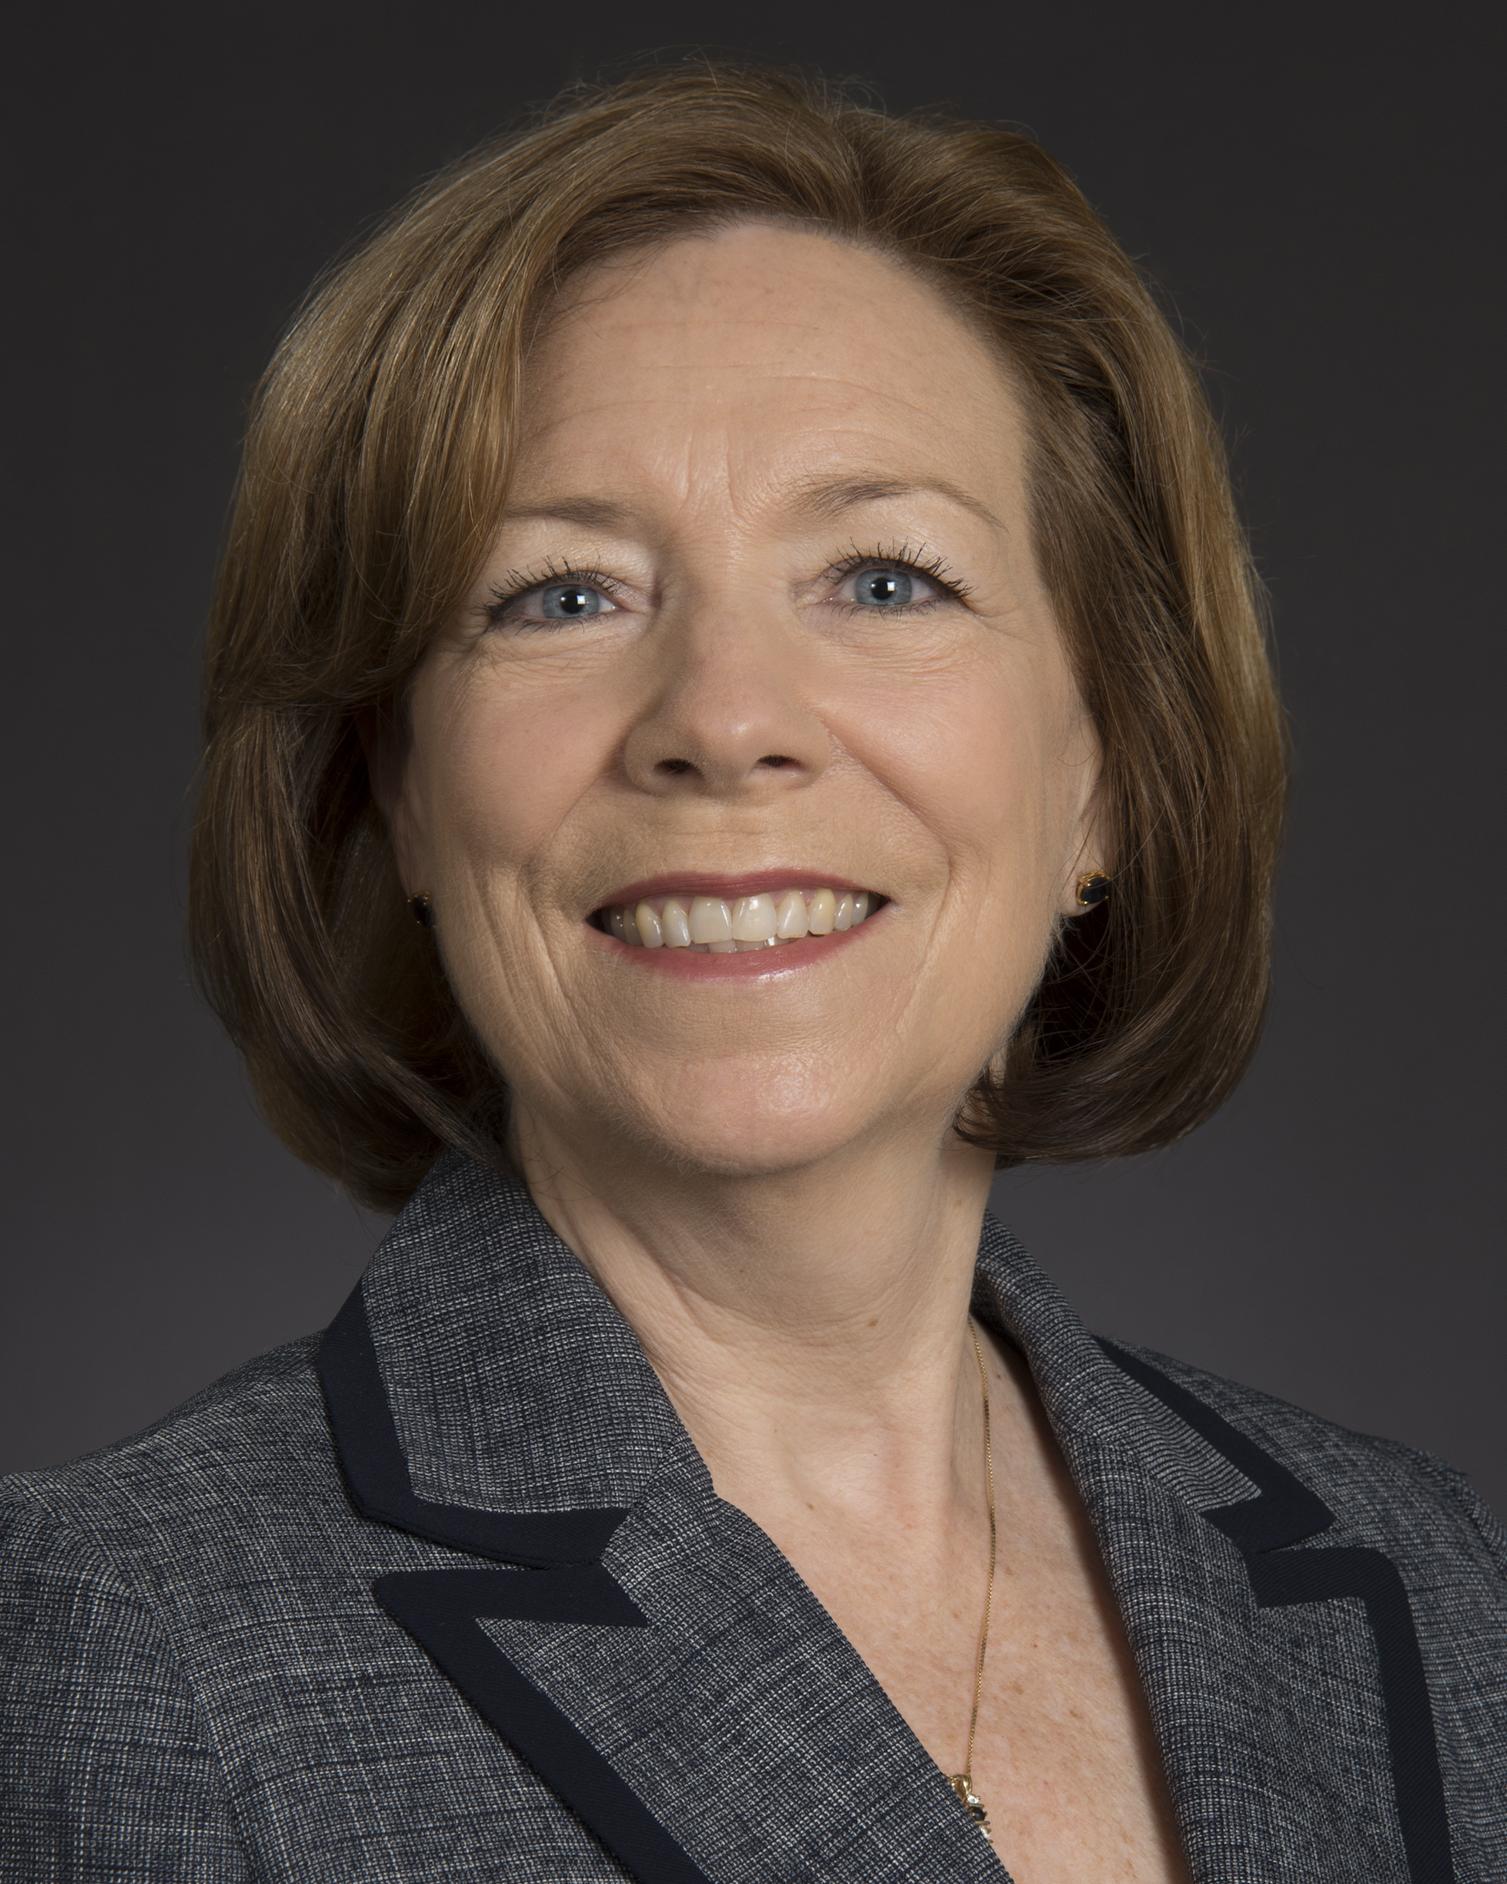 Dr. Linda Plank